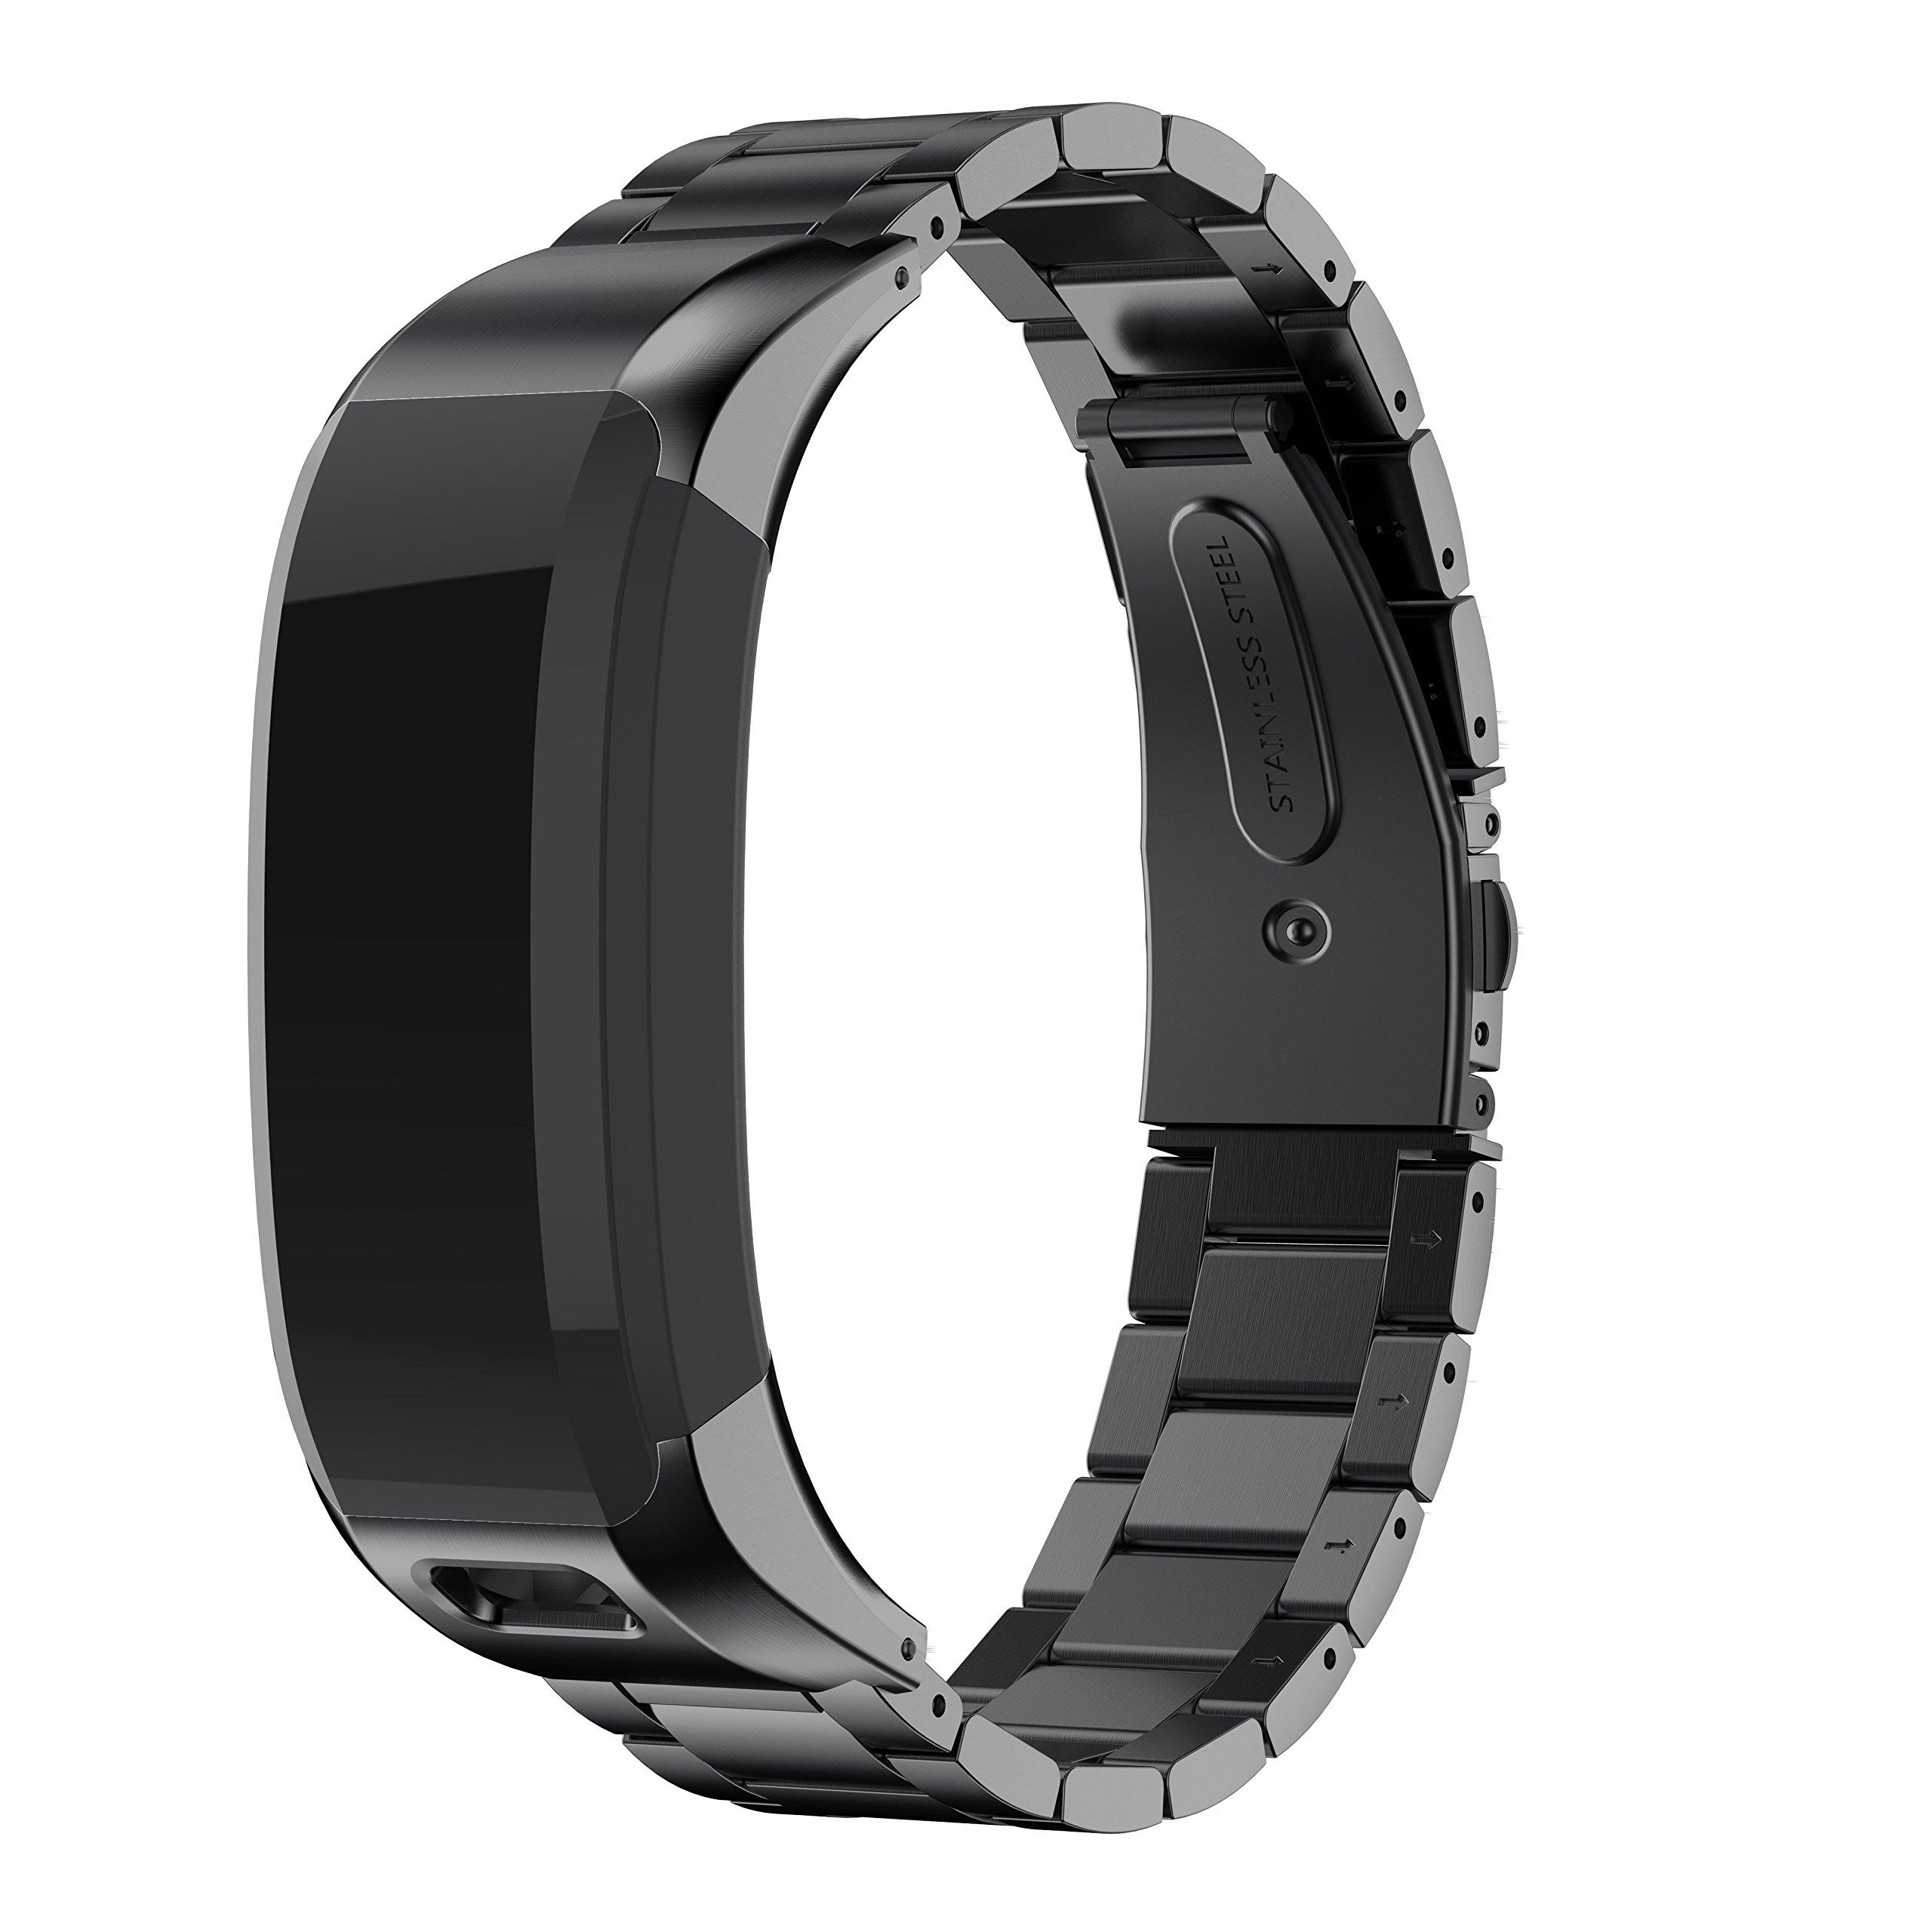 ANCOOL Garmin Vivosmart HR watch band, smart watch accessory stainless steel replacement braceklet unique high grade watch decor band metal straps for Garmin Vivosmart (NOT for Vivosmart HR+)